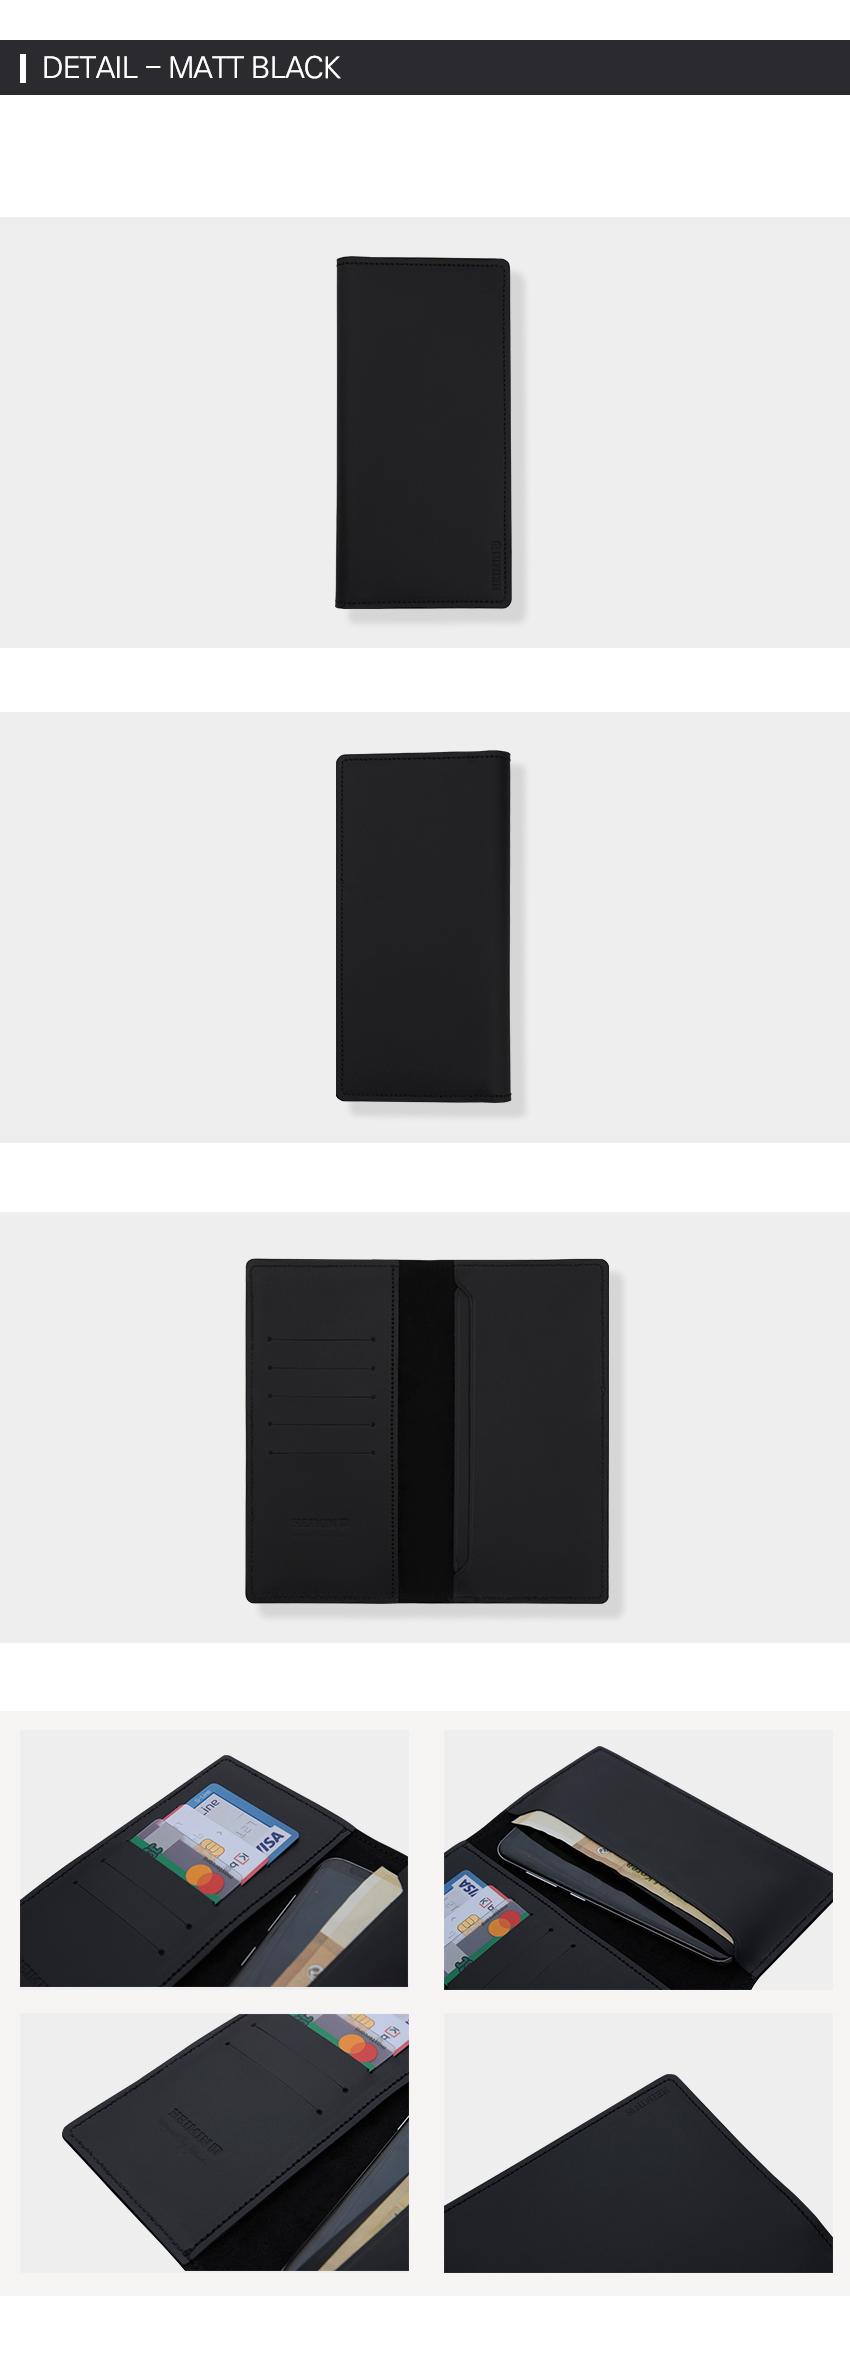 6. black detail.jpg